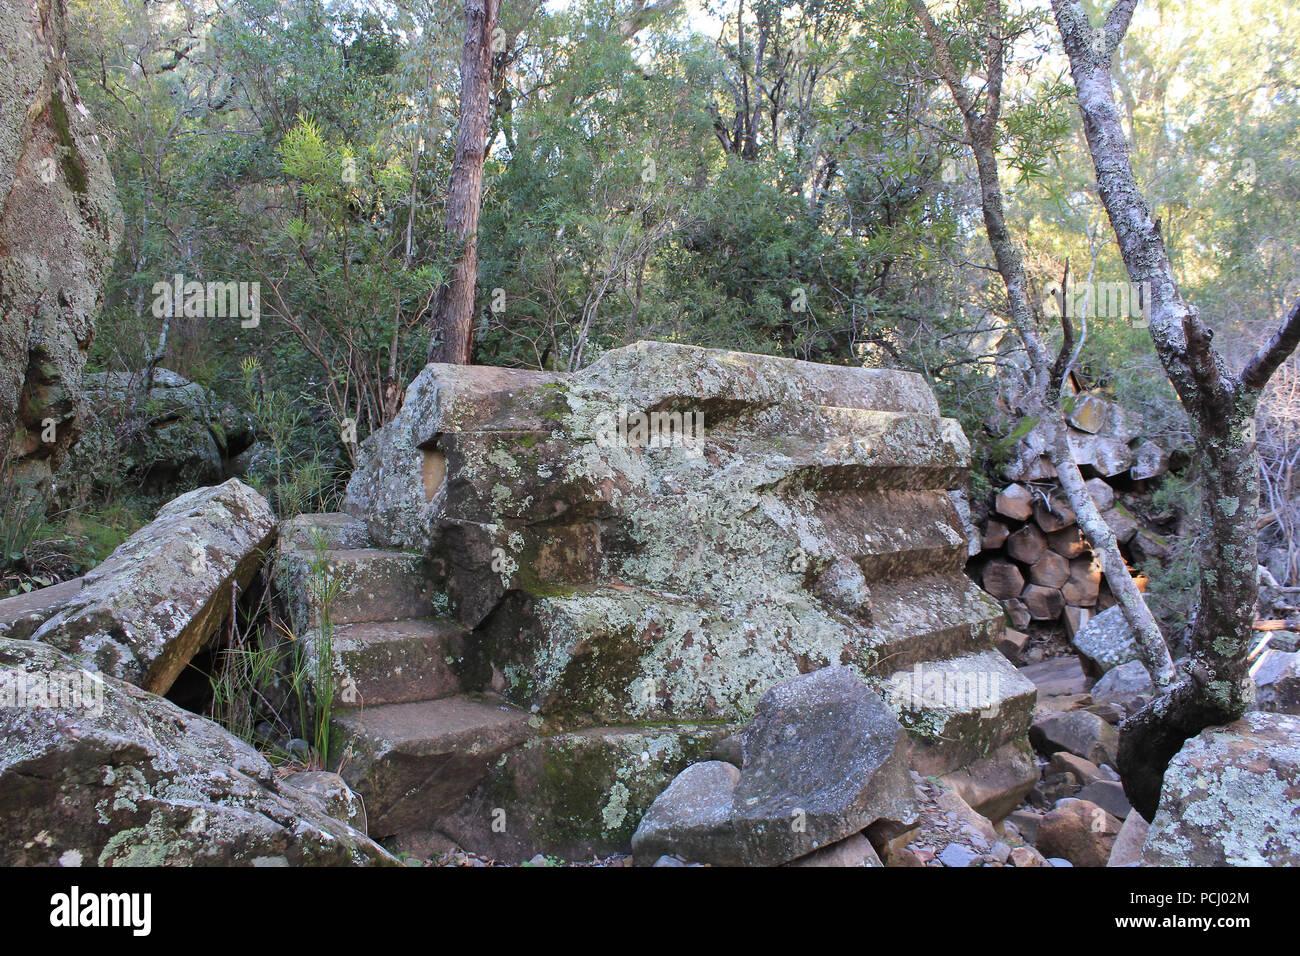 The ancient volcanic rock has formed a rock formation known as 'organ-piping' at Sawn Rocks, Mt Kaputar National Park, Narrabri, NSW, Australia. - Stock Image